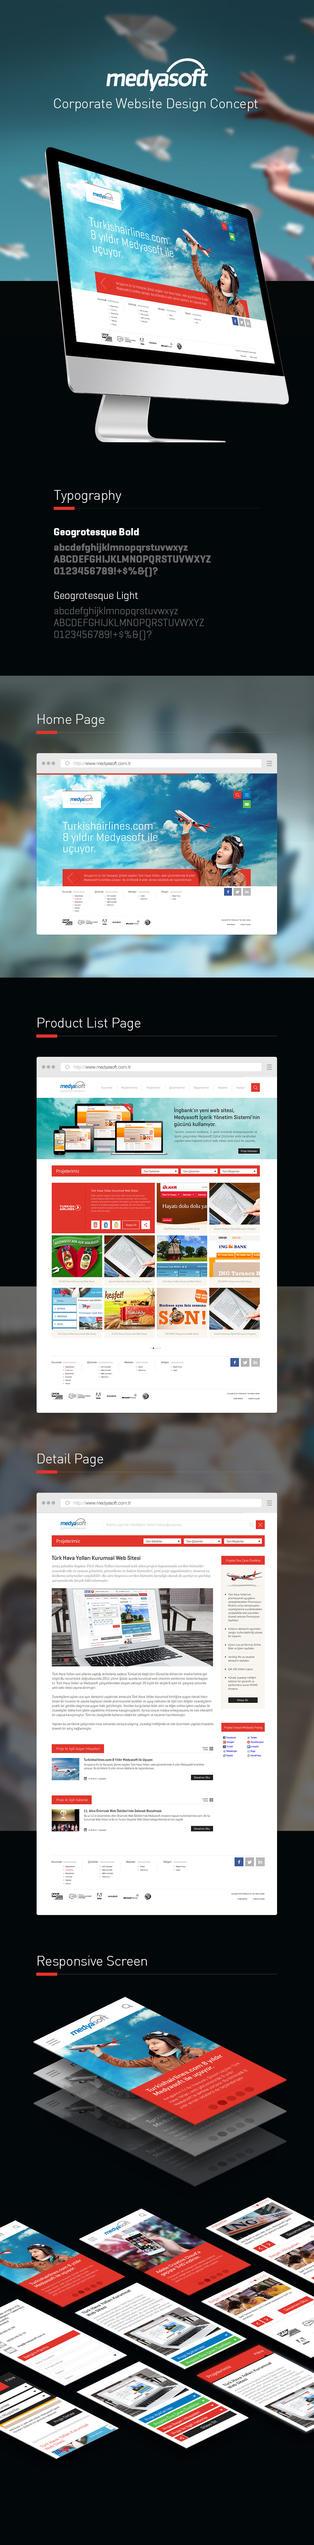 Medyasoft Web Design - Casestudy by eskikitapci